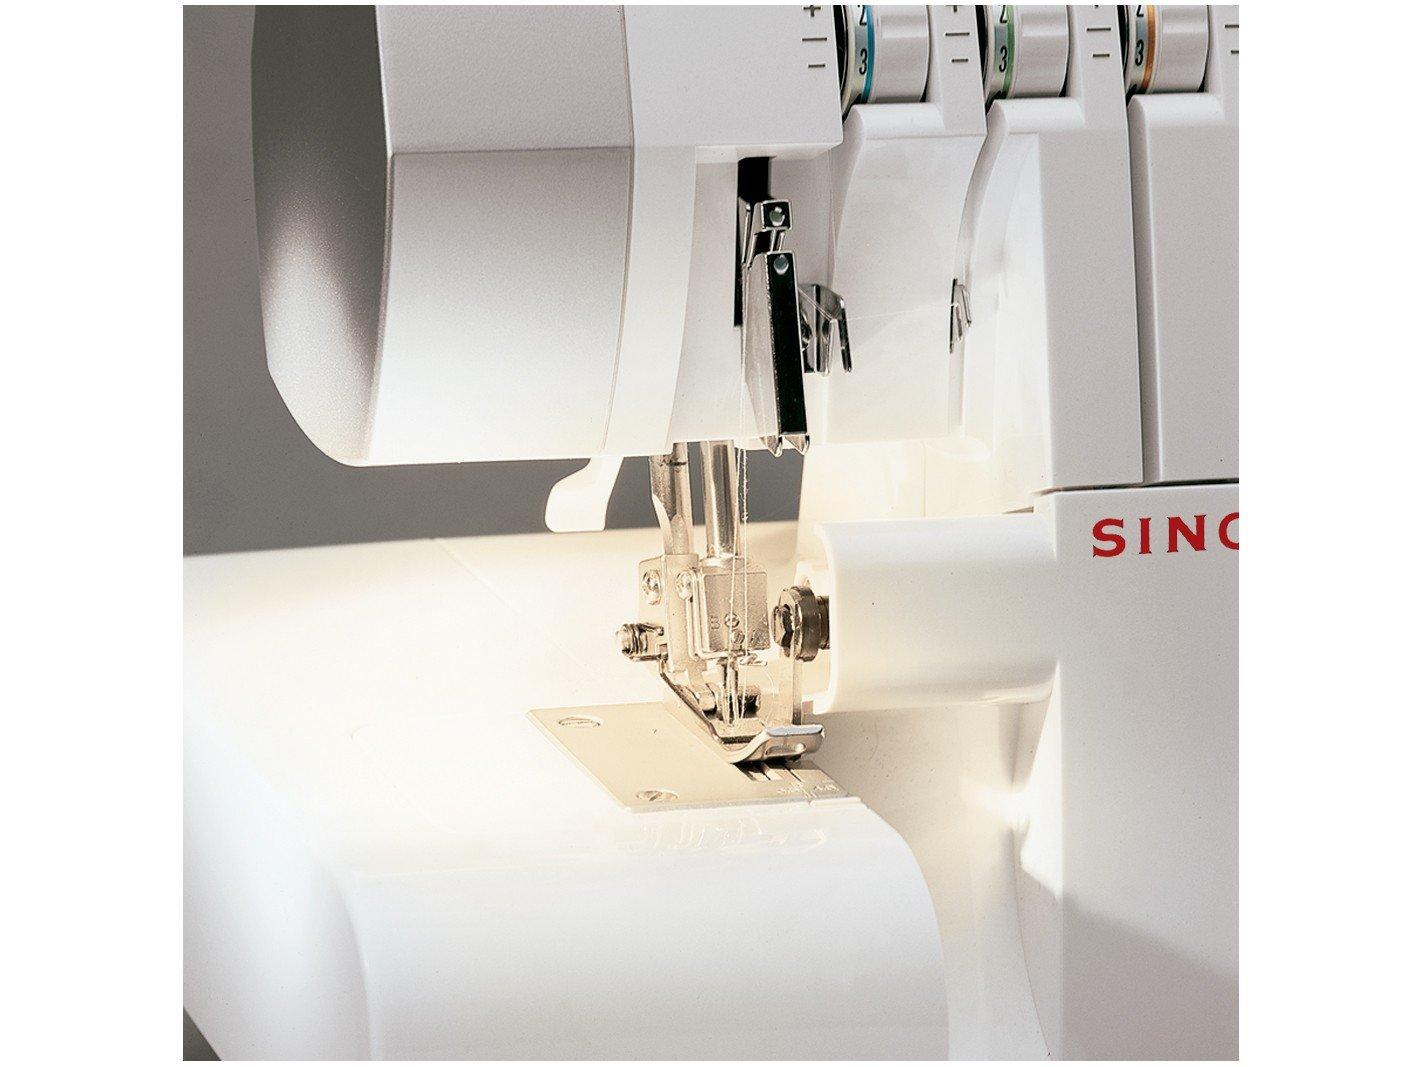 Máquina de Costura Overloque Singer Ultralock 14SH754 - Branca - 110V - 8